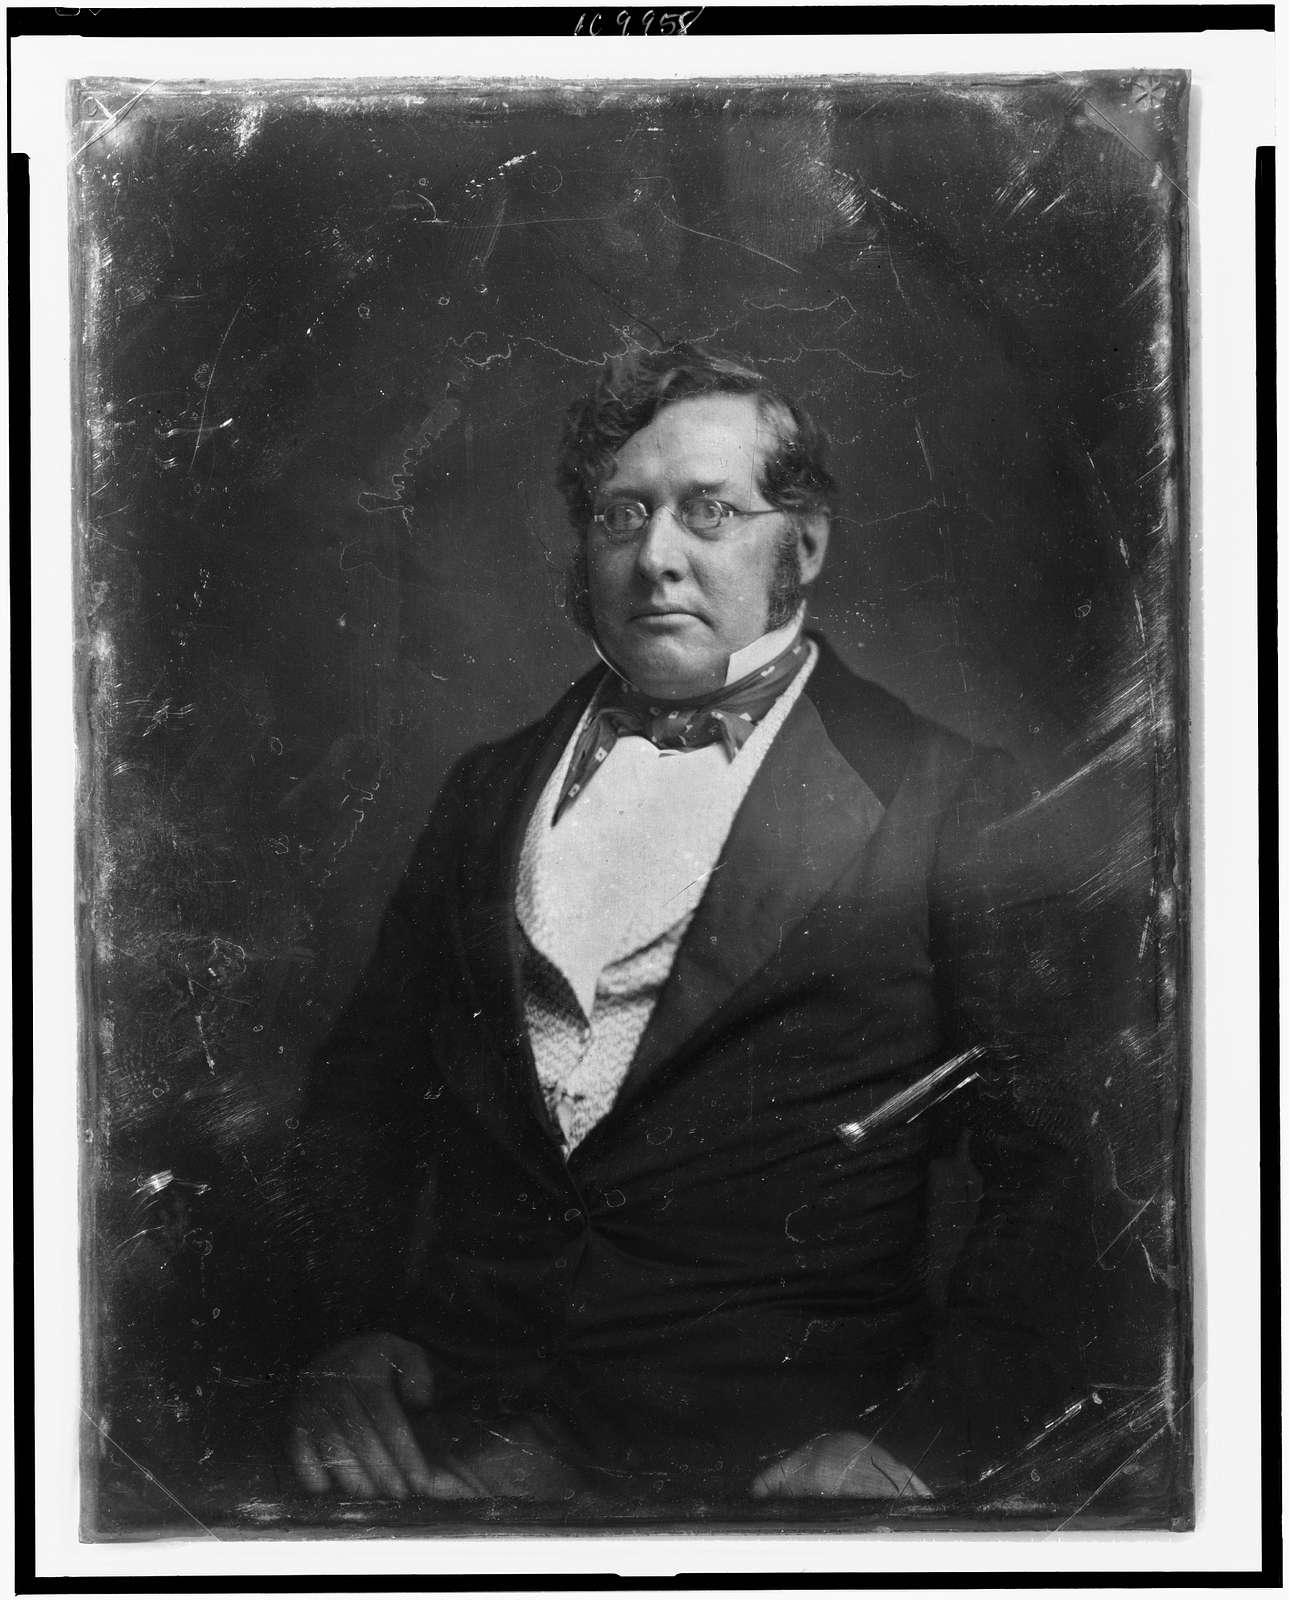 [Thomas George Pratt, half-length portrait, slightly to left]